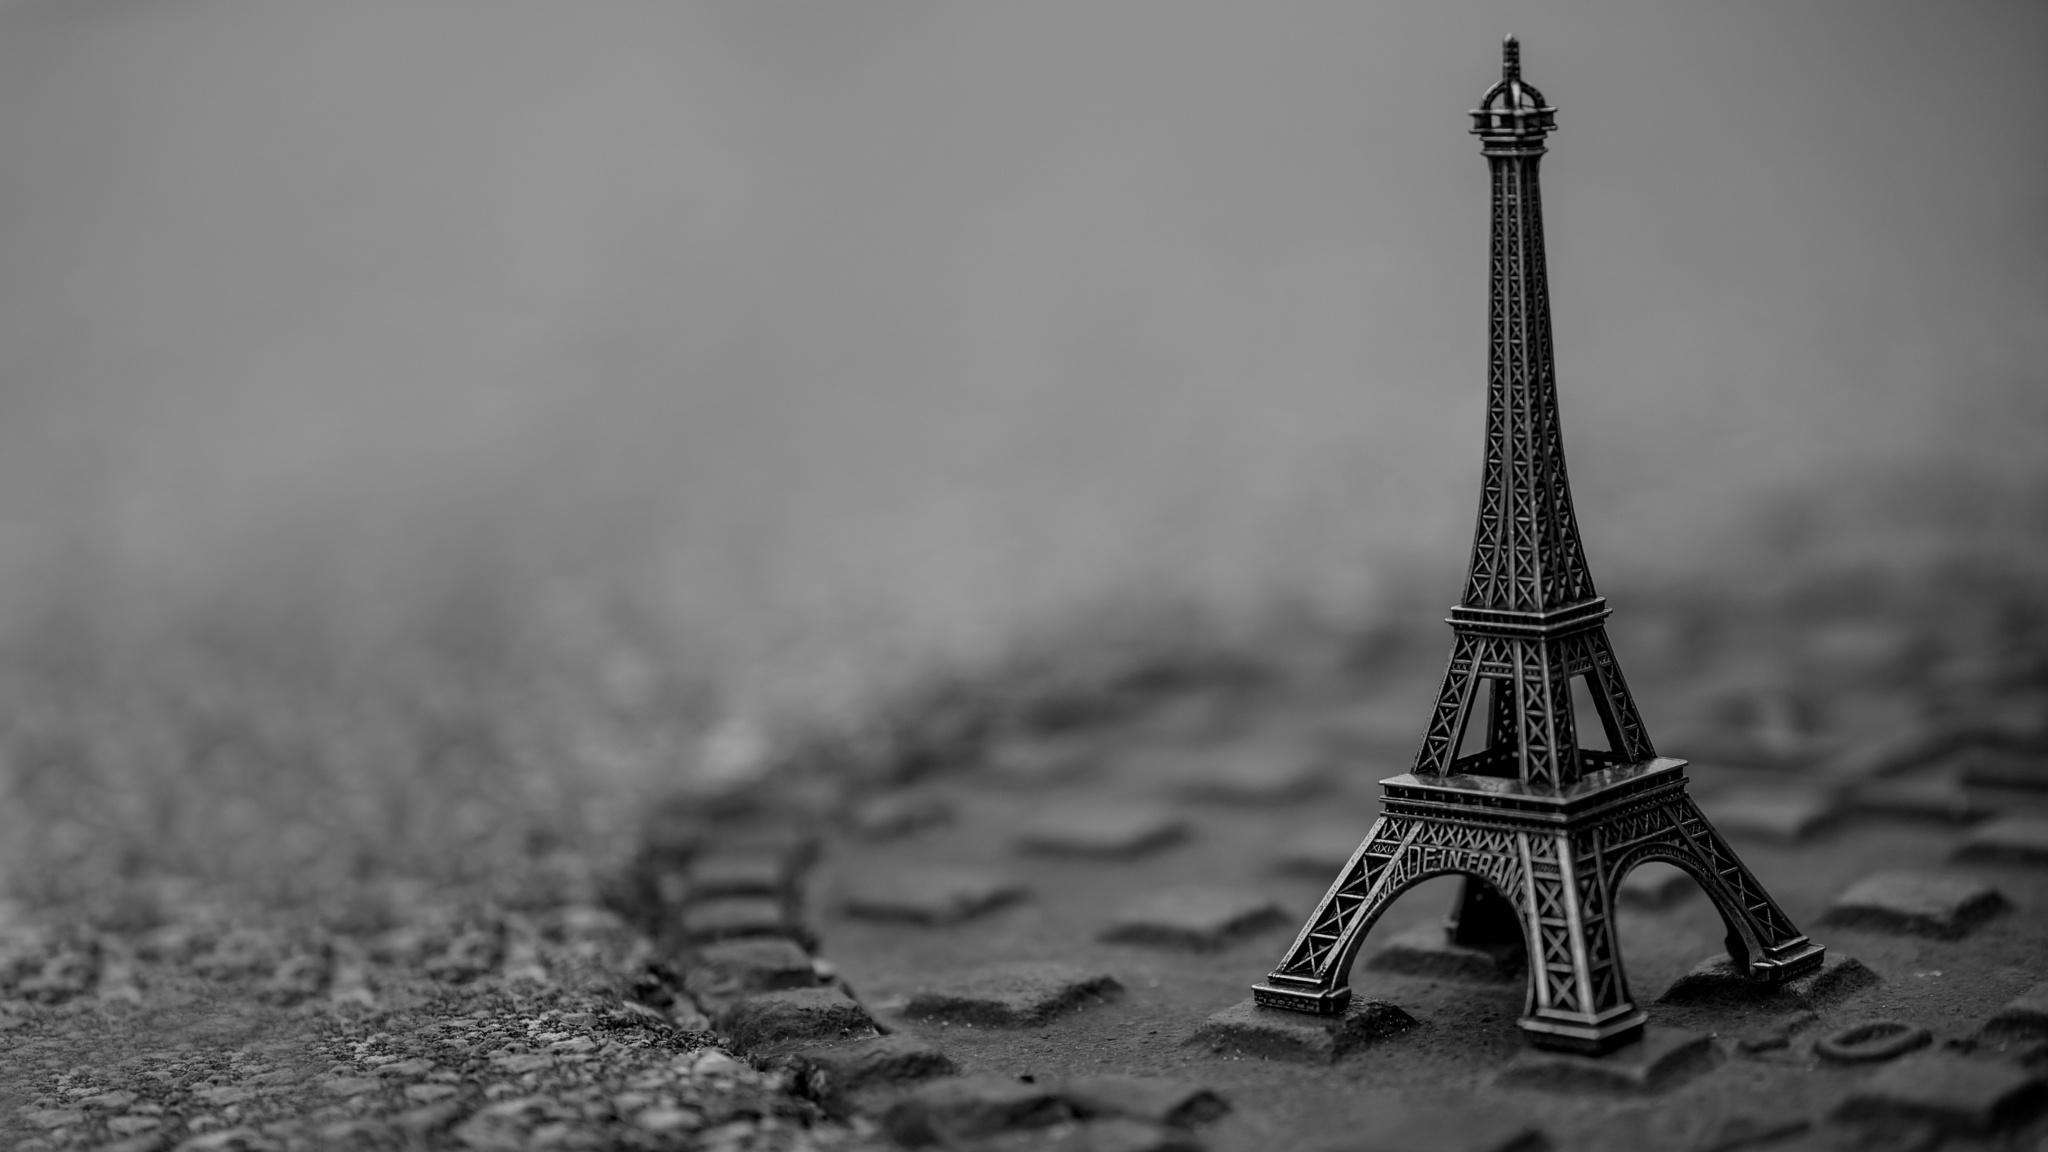 Eiffel Mini Tower by AlexTrillium